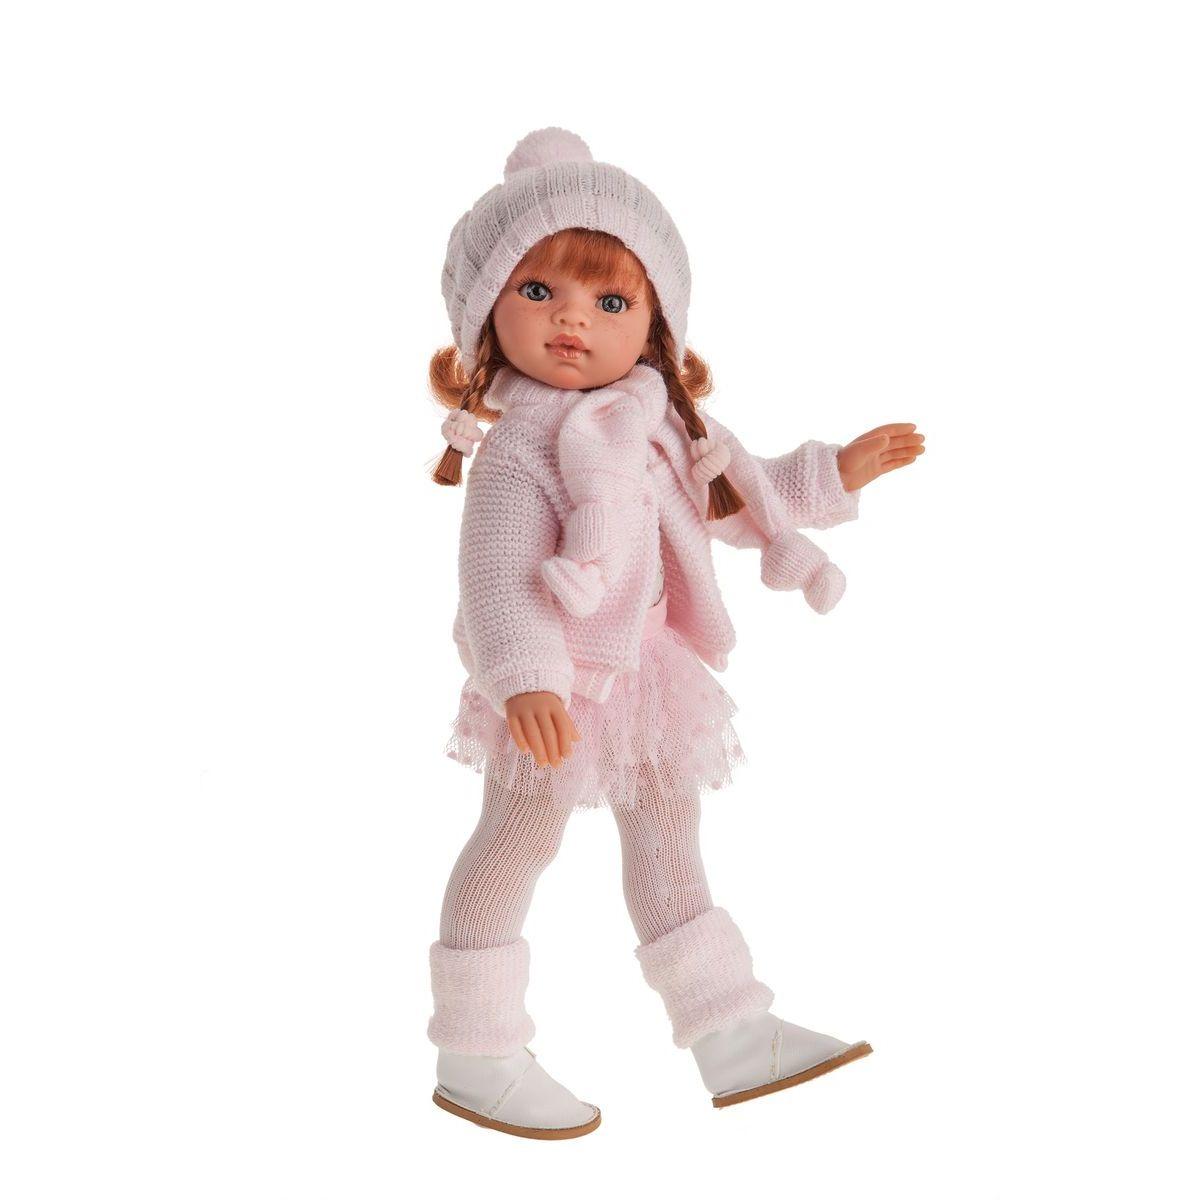 Antonio Juan 2585 Emily realistická panenka s celovinylovým tělem 33 cm